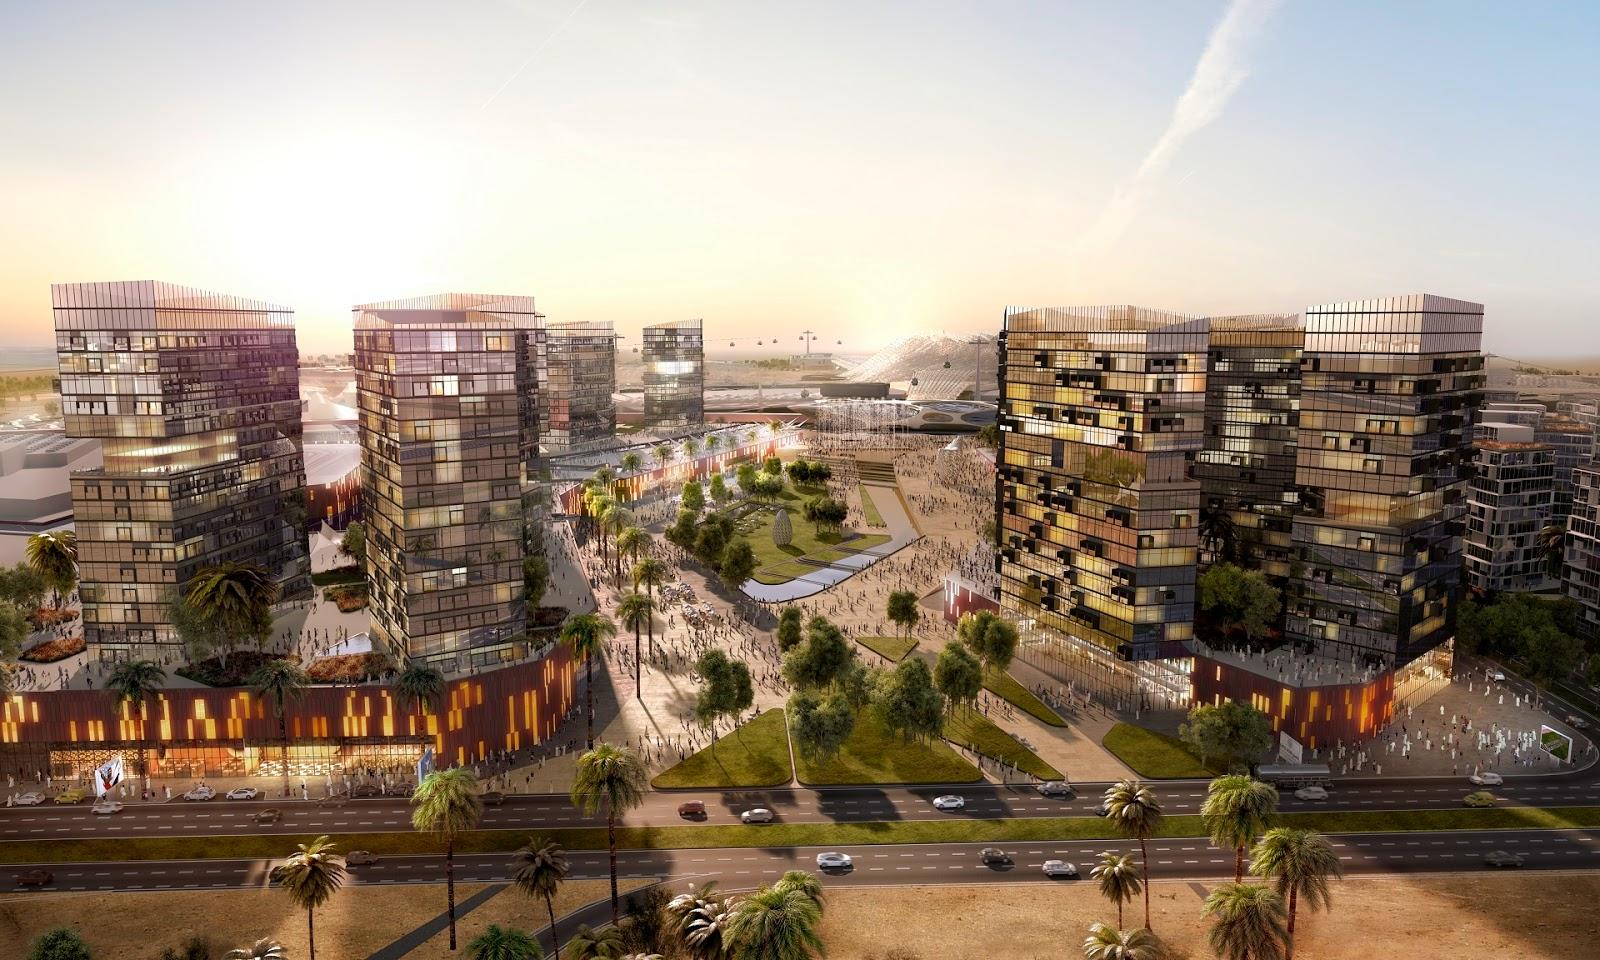 Expo 2020 Dubai UAE Rudy Deighton (15)